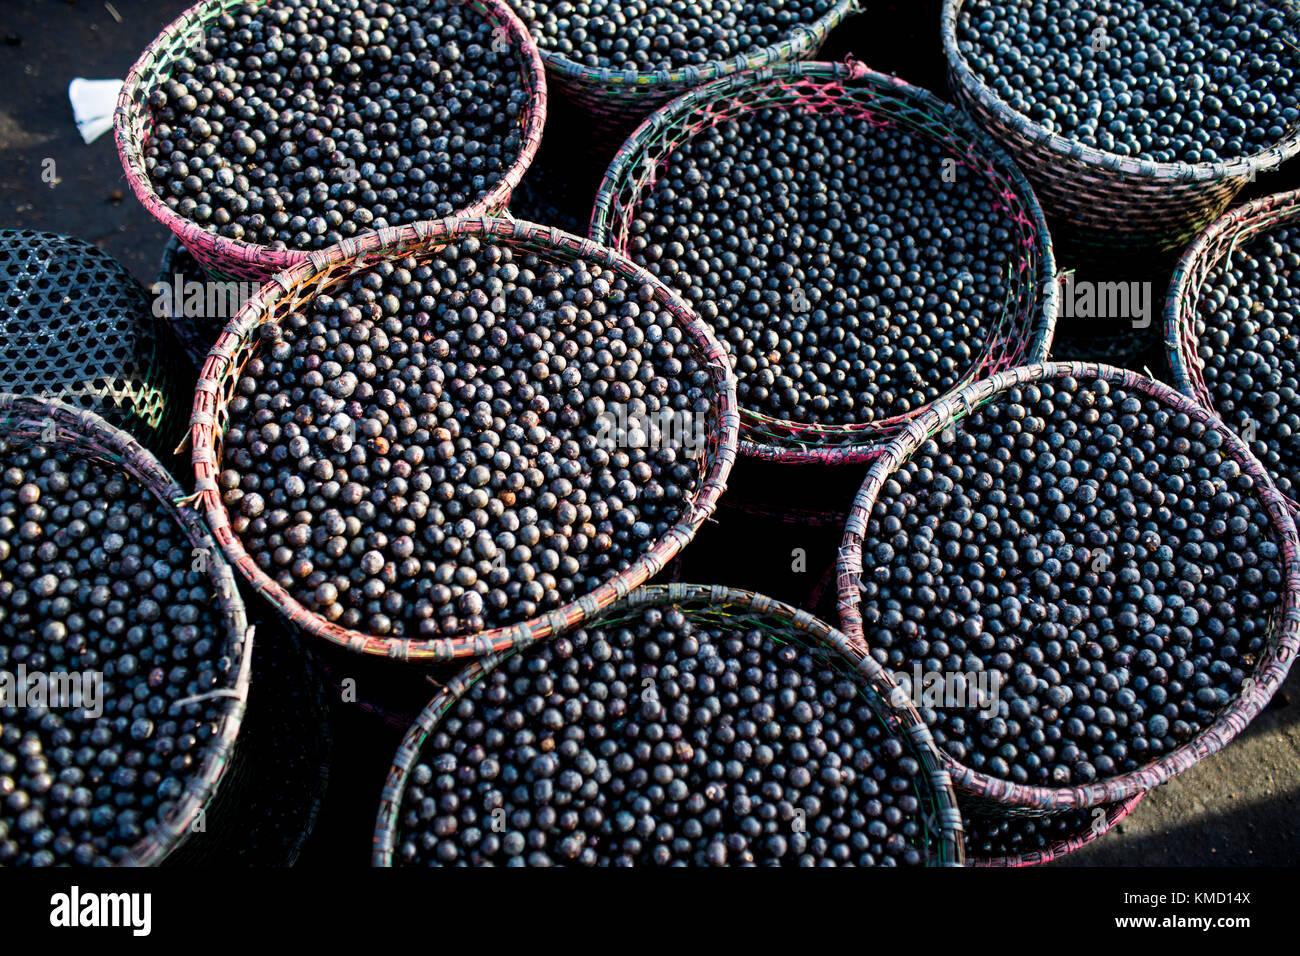 Macapa, Brazil. 17th Nov, 2017. Baskets of Acai berries on sale at the market in Macapa, Brazil, 17 November 2017.Stock Photo